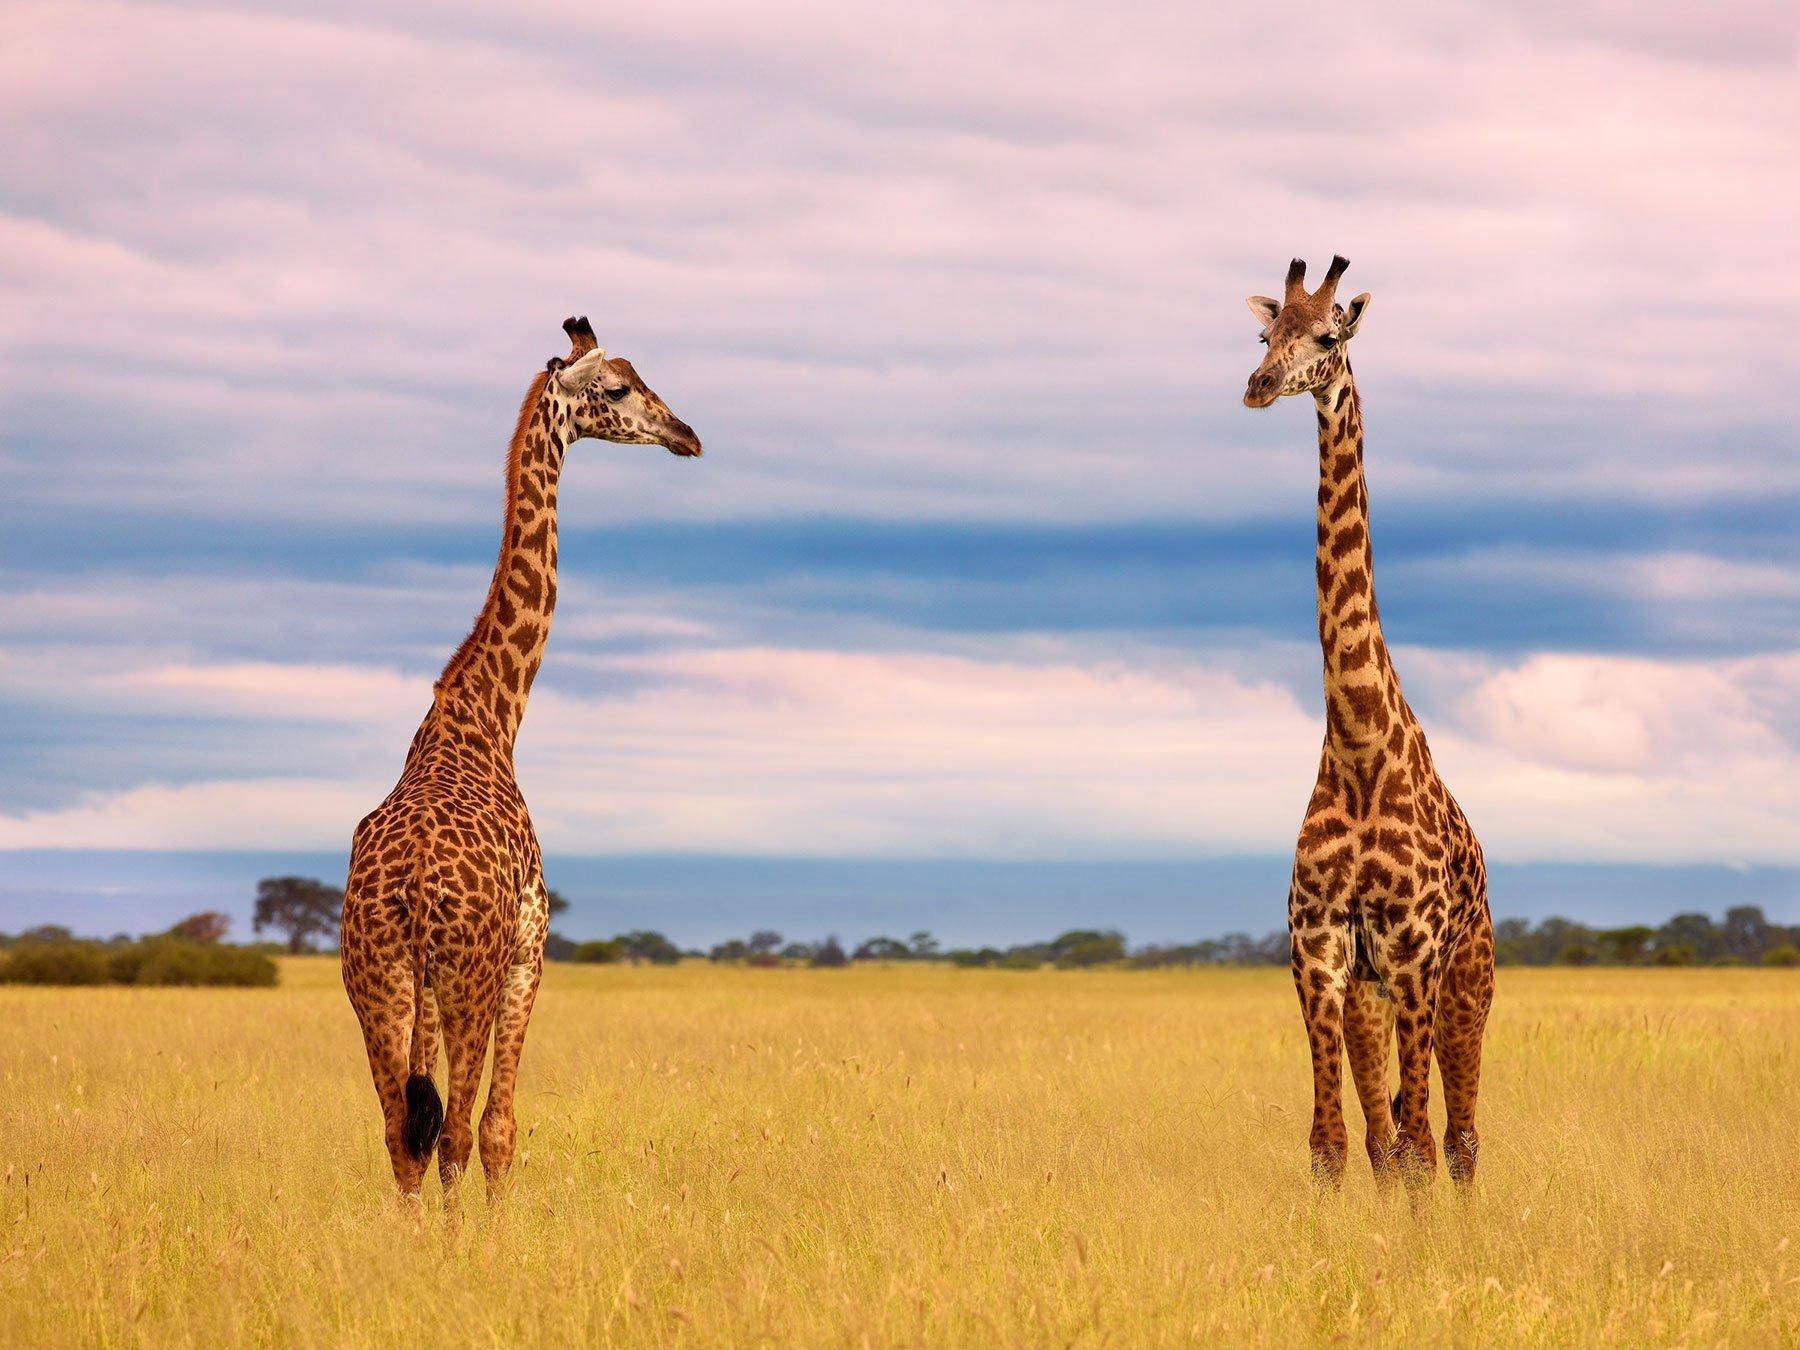 Two giraffes on the Serengetti plain, Tanzania, Africa.